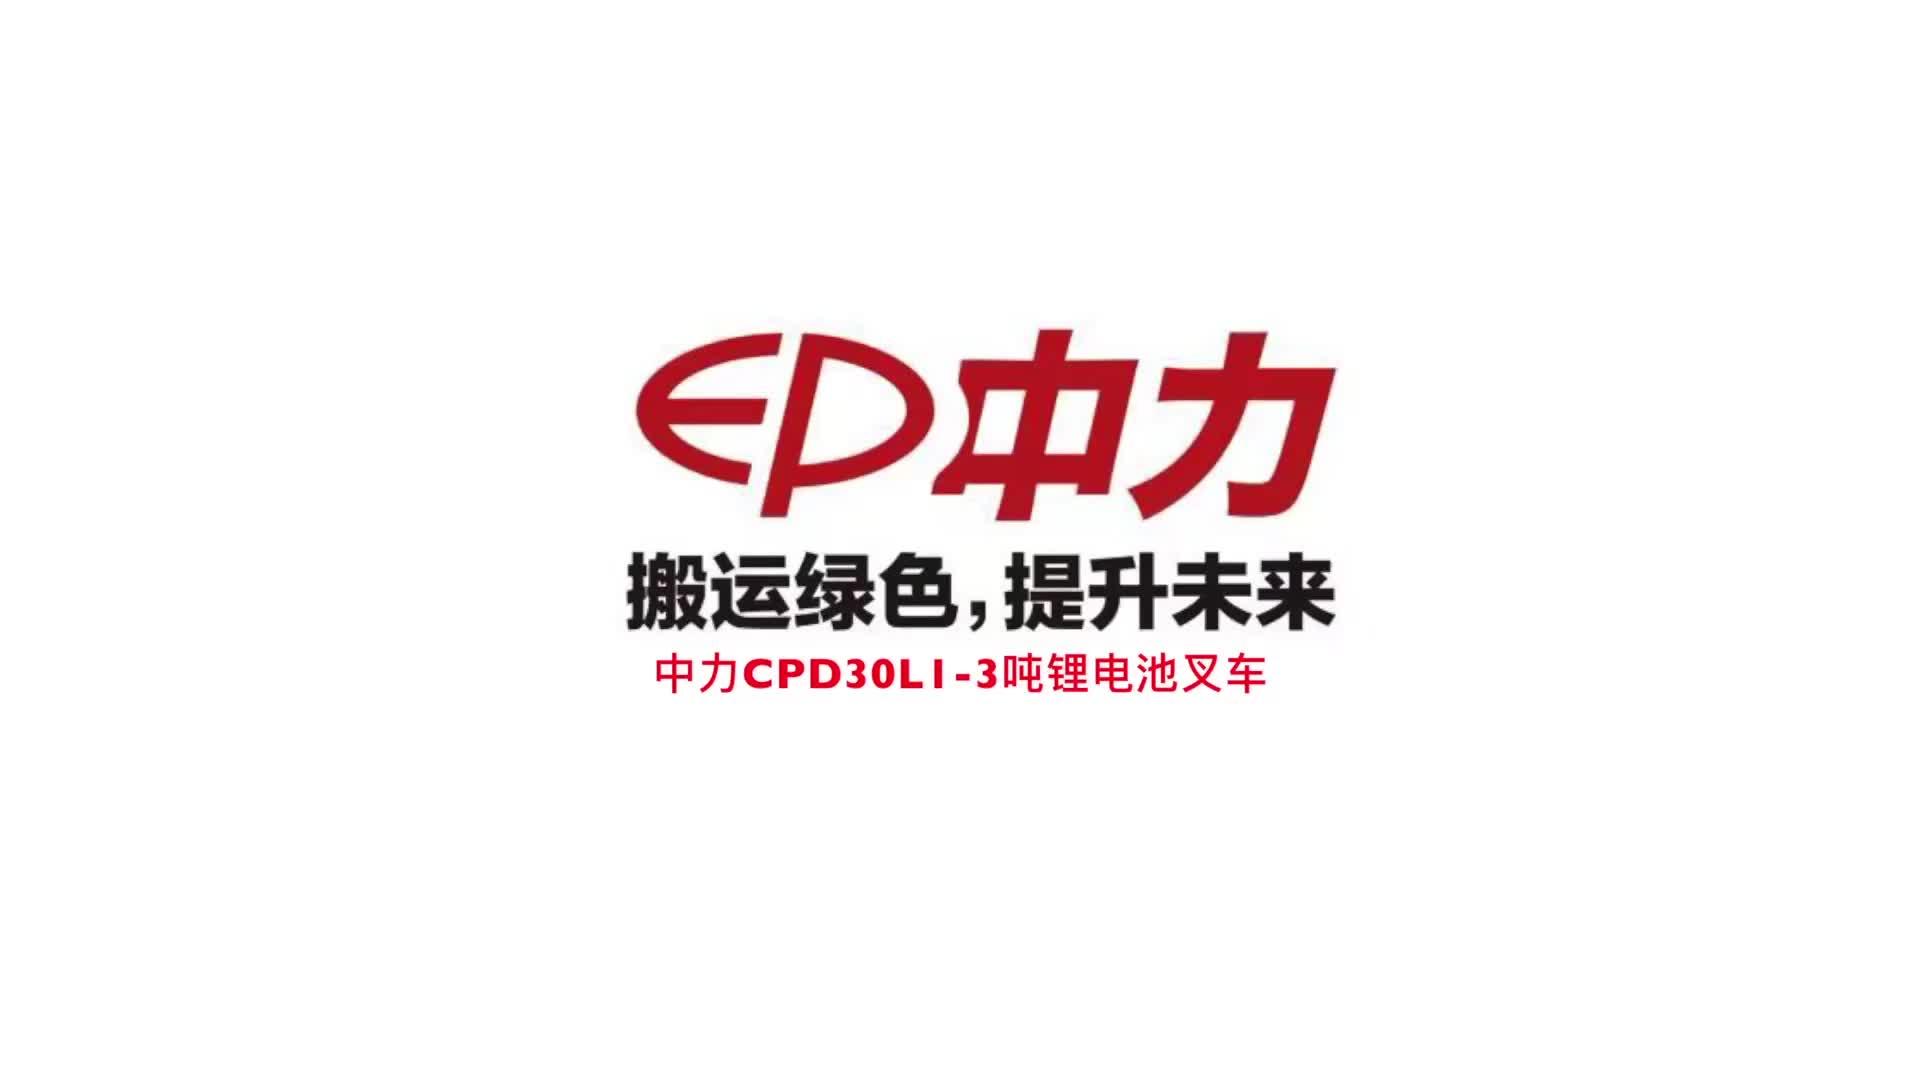 CPD30_35L1B 3.03.5吨电动平衡重叉车 锂电壹号